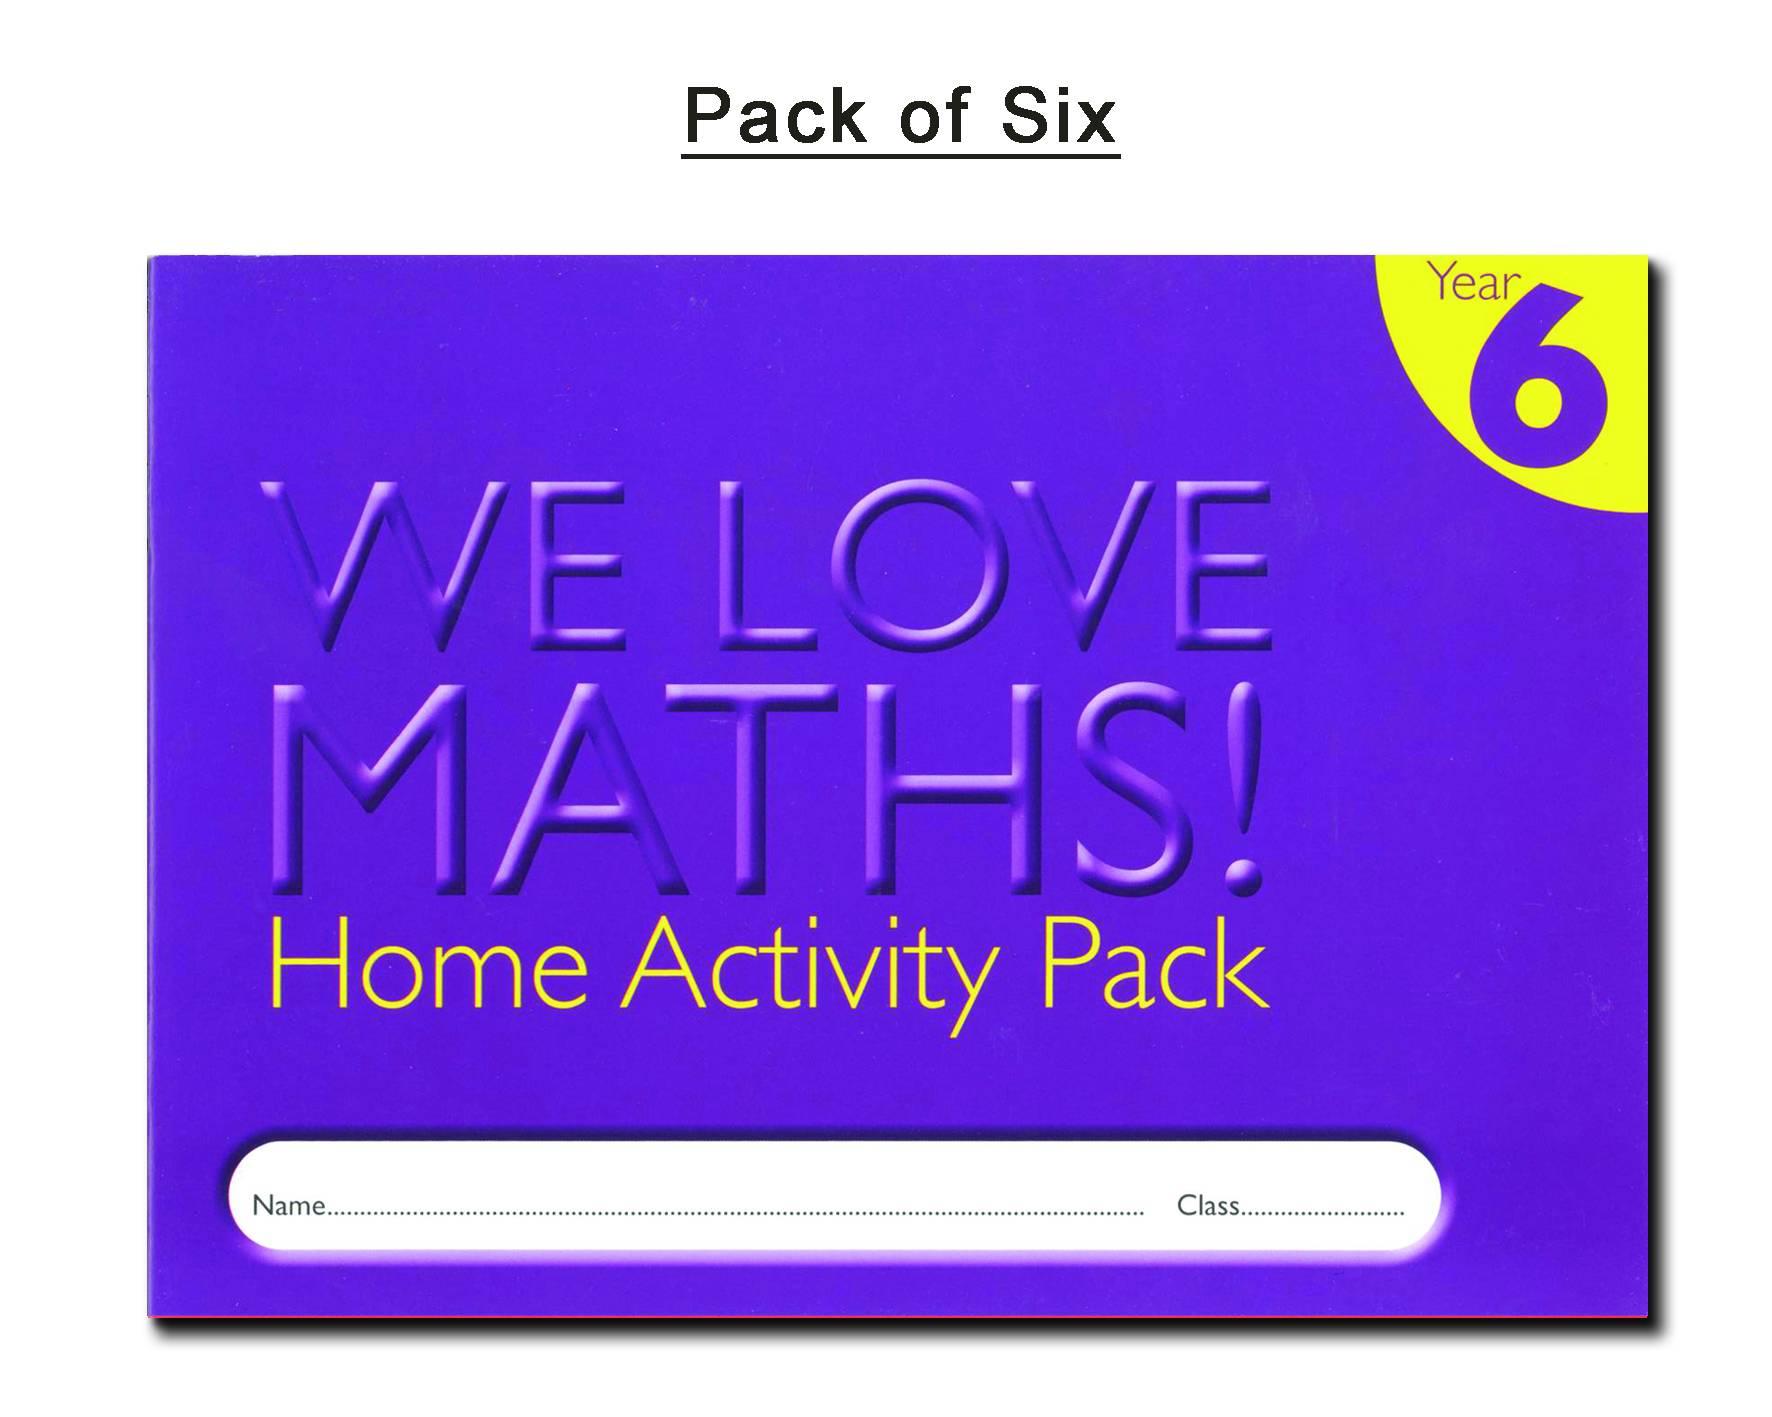 HOMEWORK ACTIVITY DIARY - YEAR 6 (PACK OF 6)